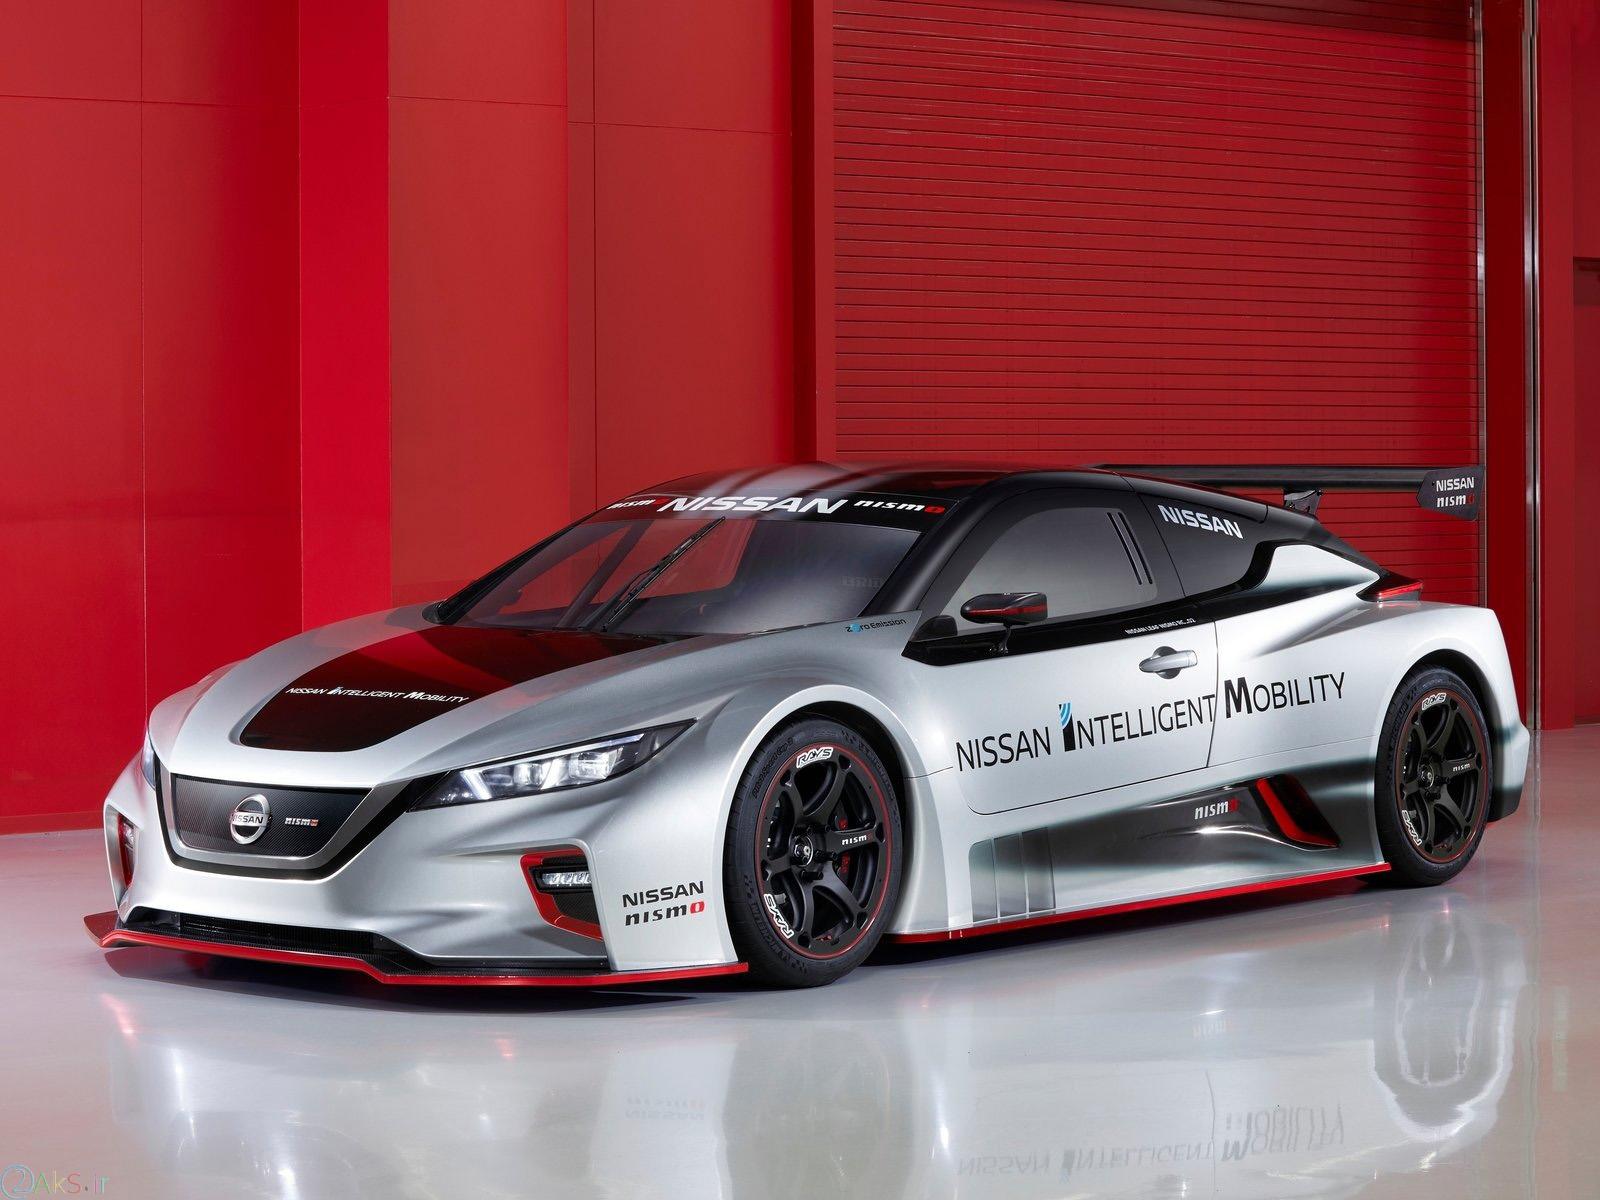 u;s Nissan Leaf Nismo RC Concept